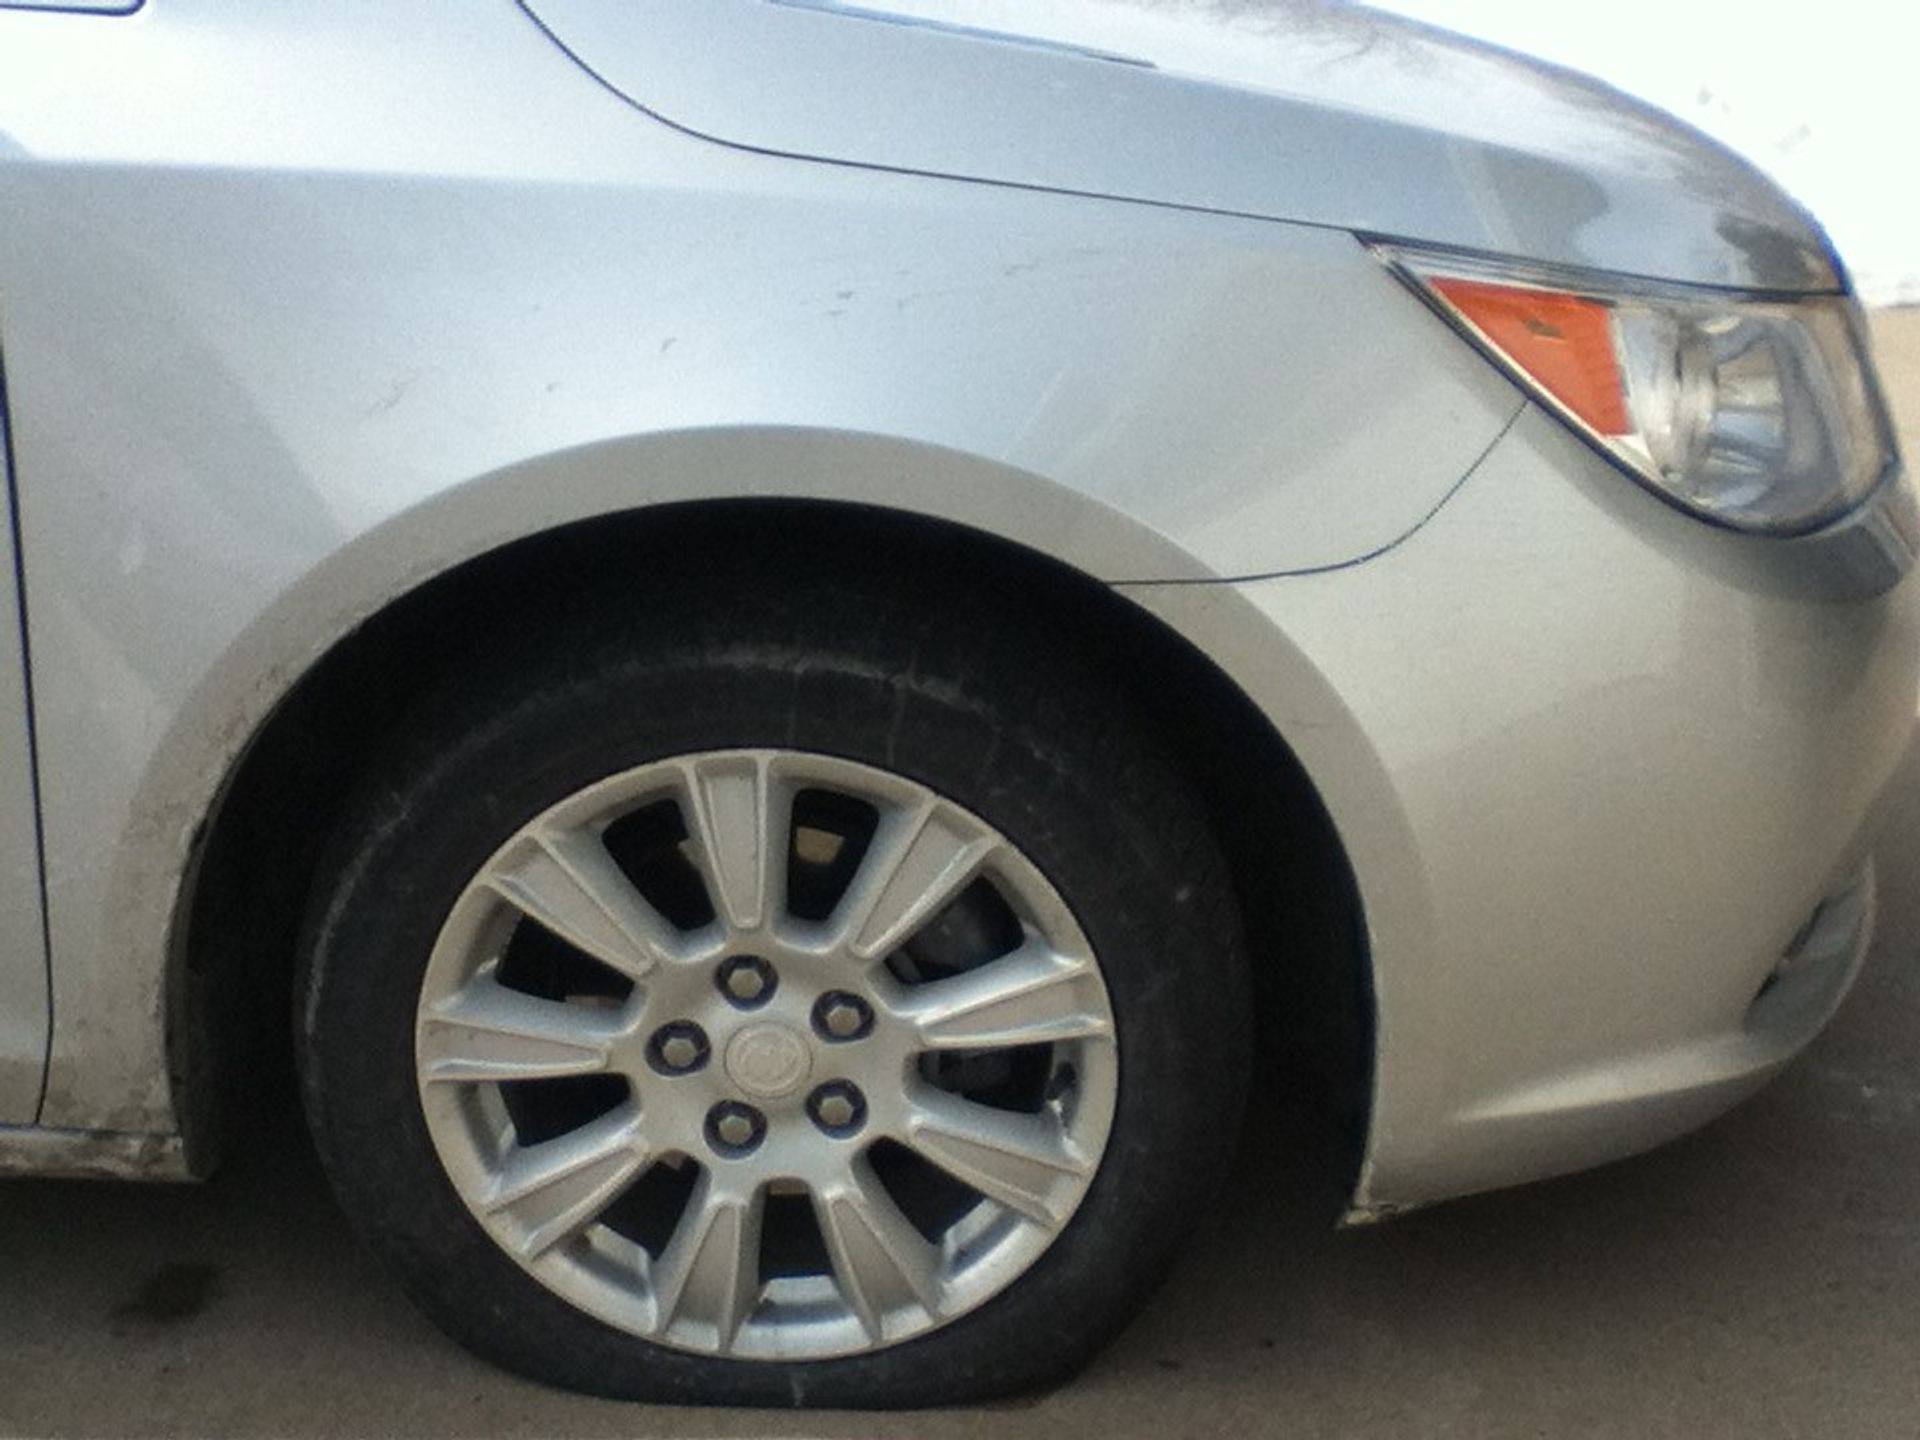 Flat Tire, Uniondale